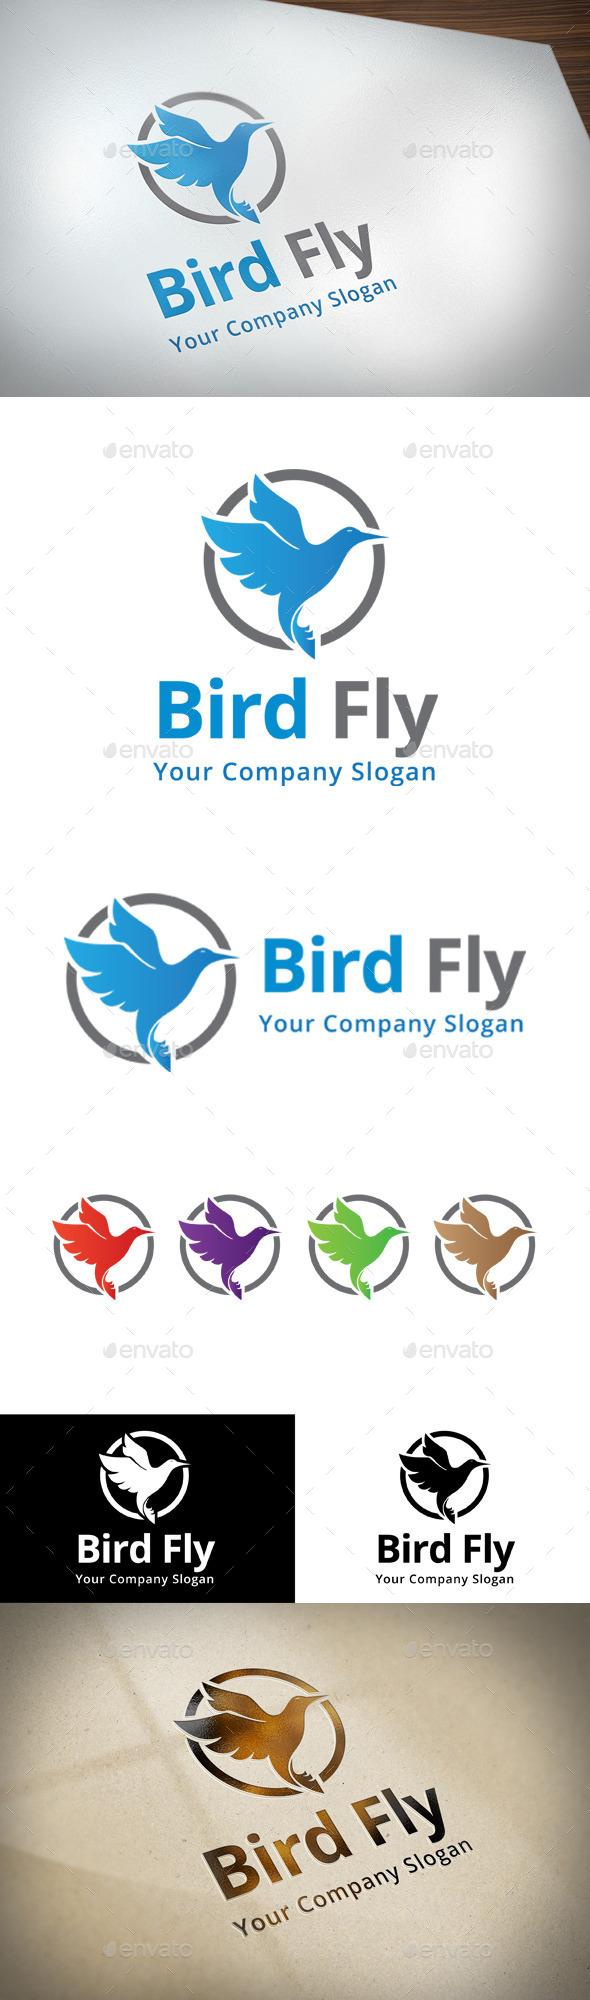 GraphicRiver Bird Fly Logo 11414672